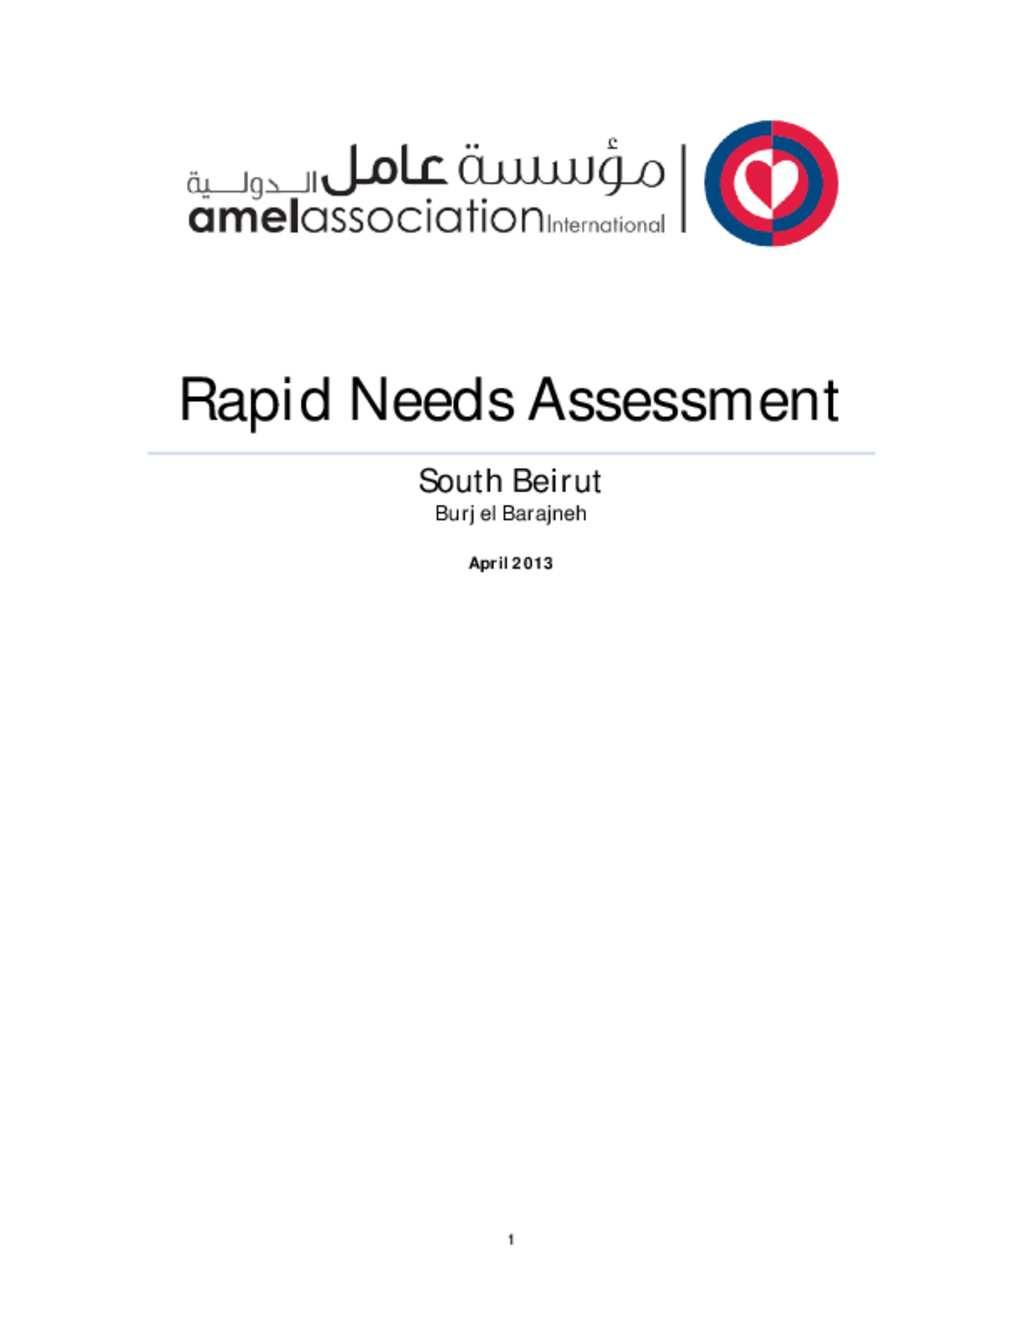 Needs Essment | Document Rapid Needs Assessment Amel